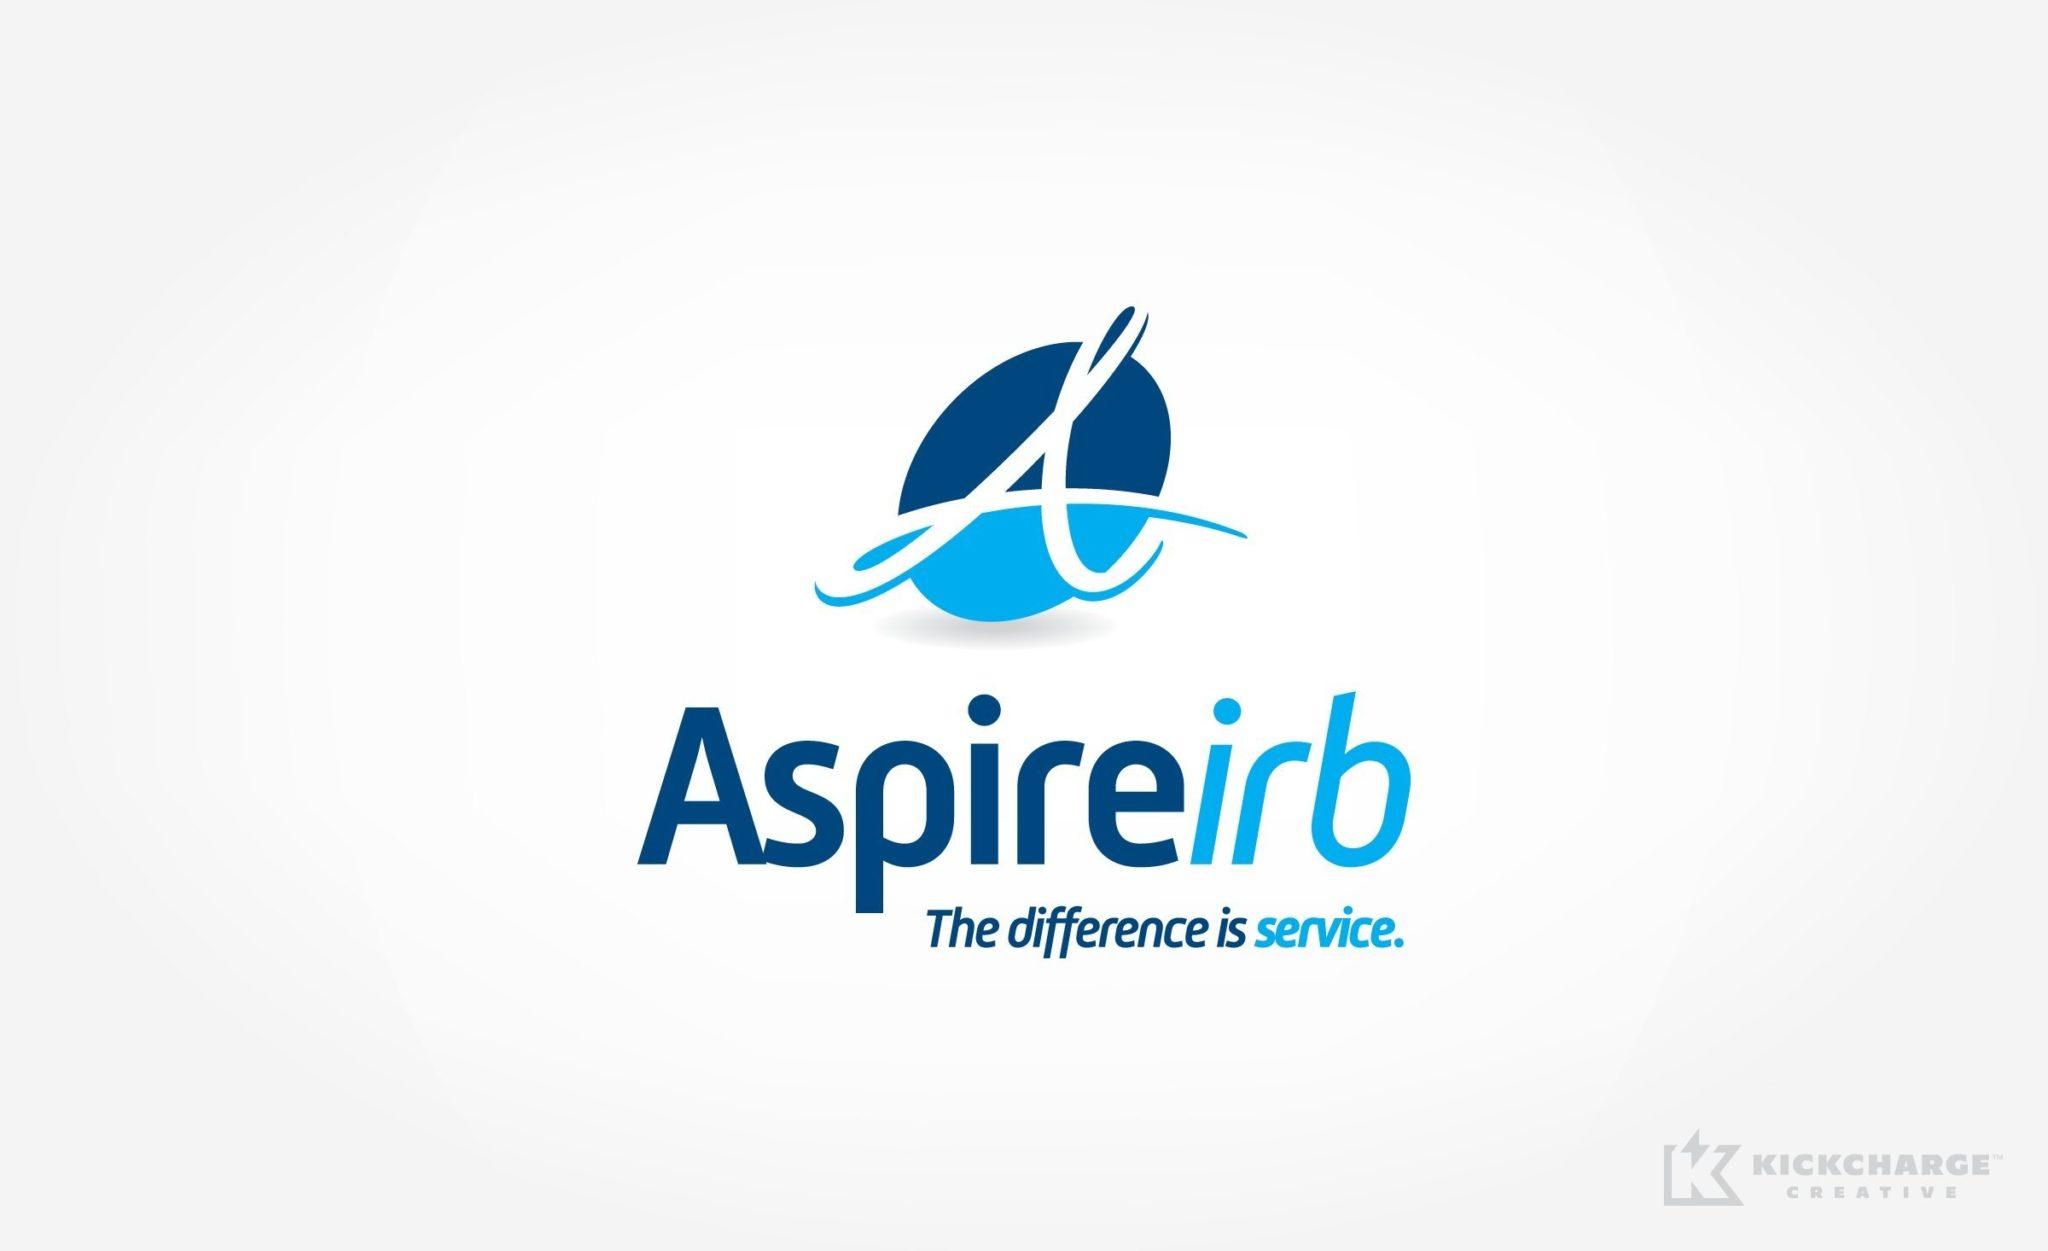 Aspire IRB